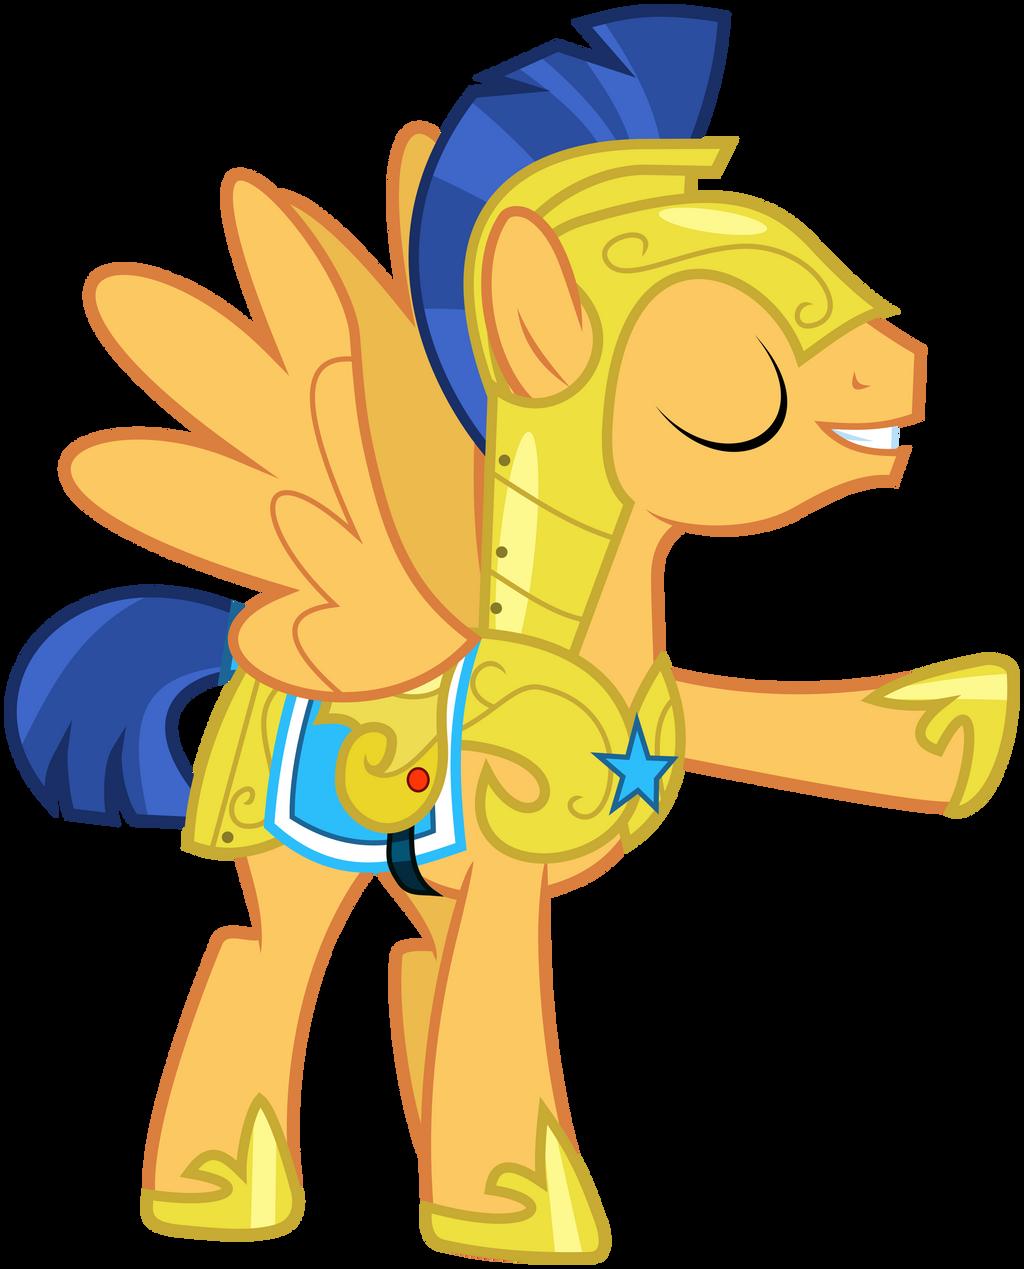 Flash Sentry (aka Brad aka Dreamy Cutebottom)